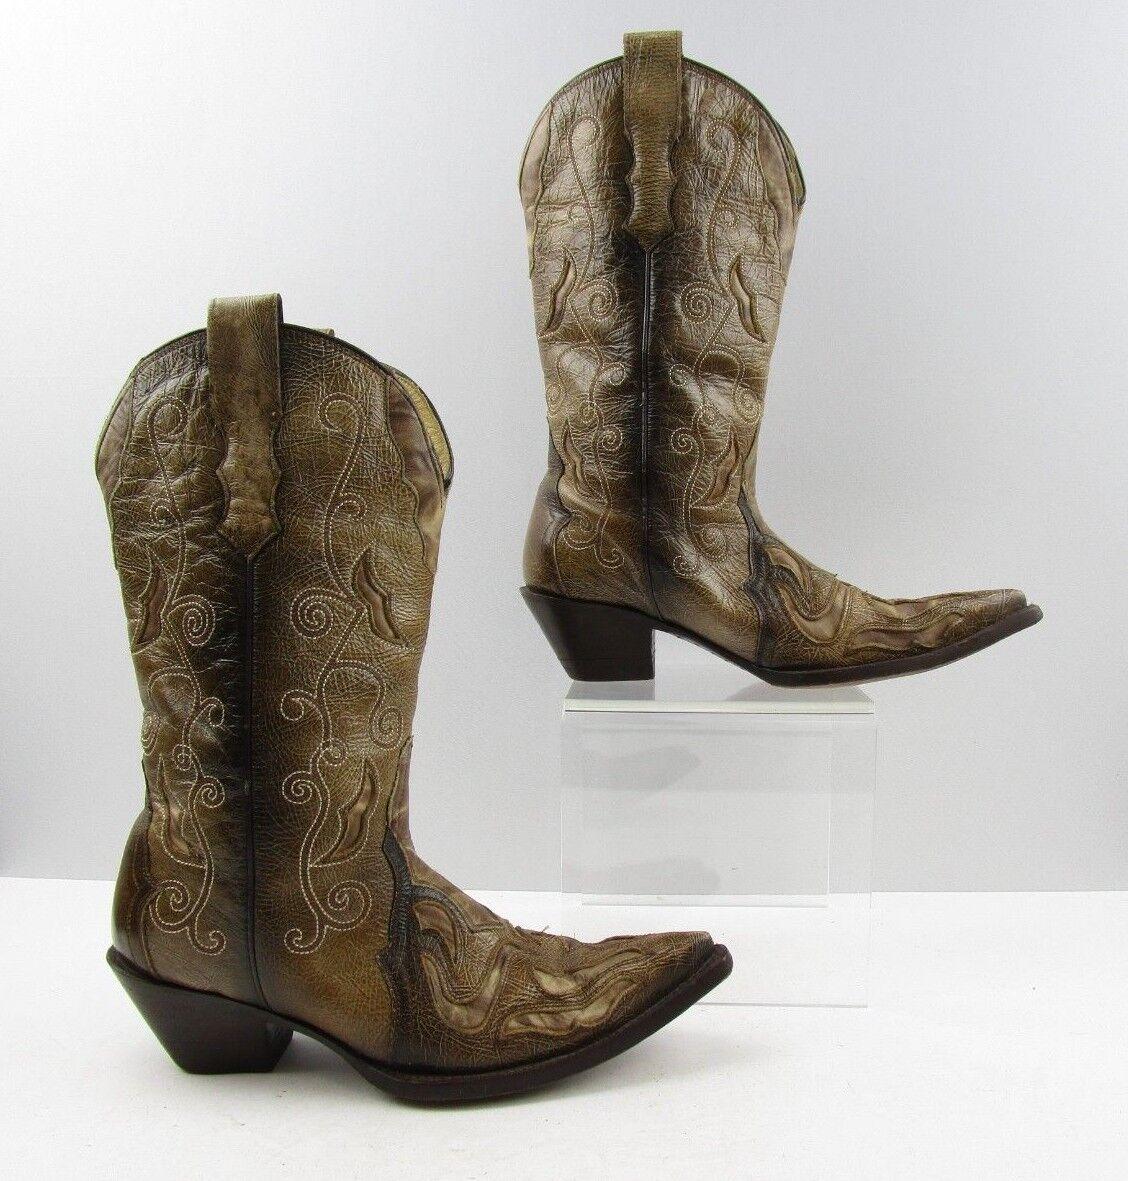 vendita outlet Ladies Corral Marrone Leather Pointed Pointed Pointed Toe Distressed Western stivali Dimensione  7 M  shopping online e negozio di moda